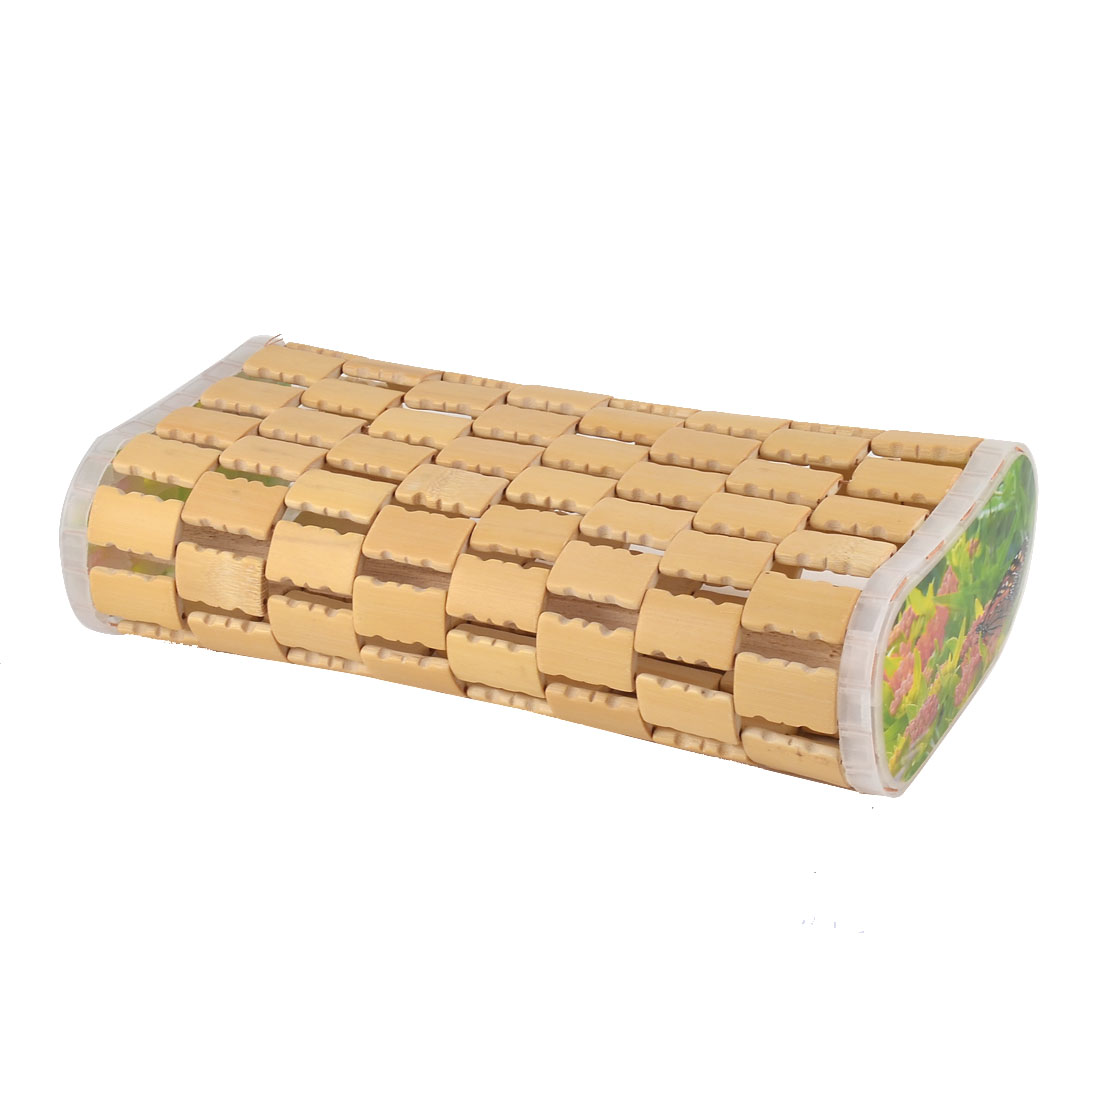 Bamboo Mesh Designed Rectangle Shape Breathable Neck Pillow 7.5 cm Height